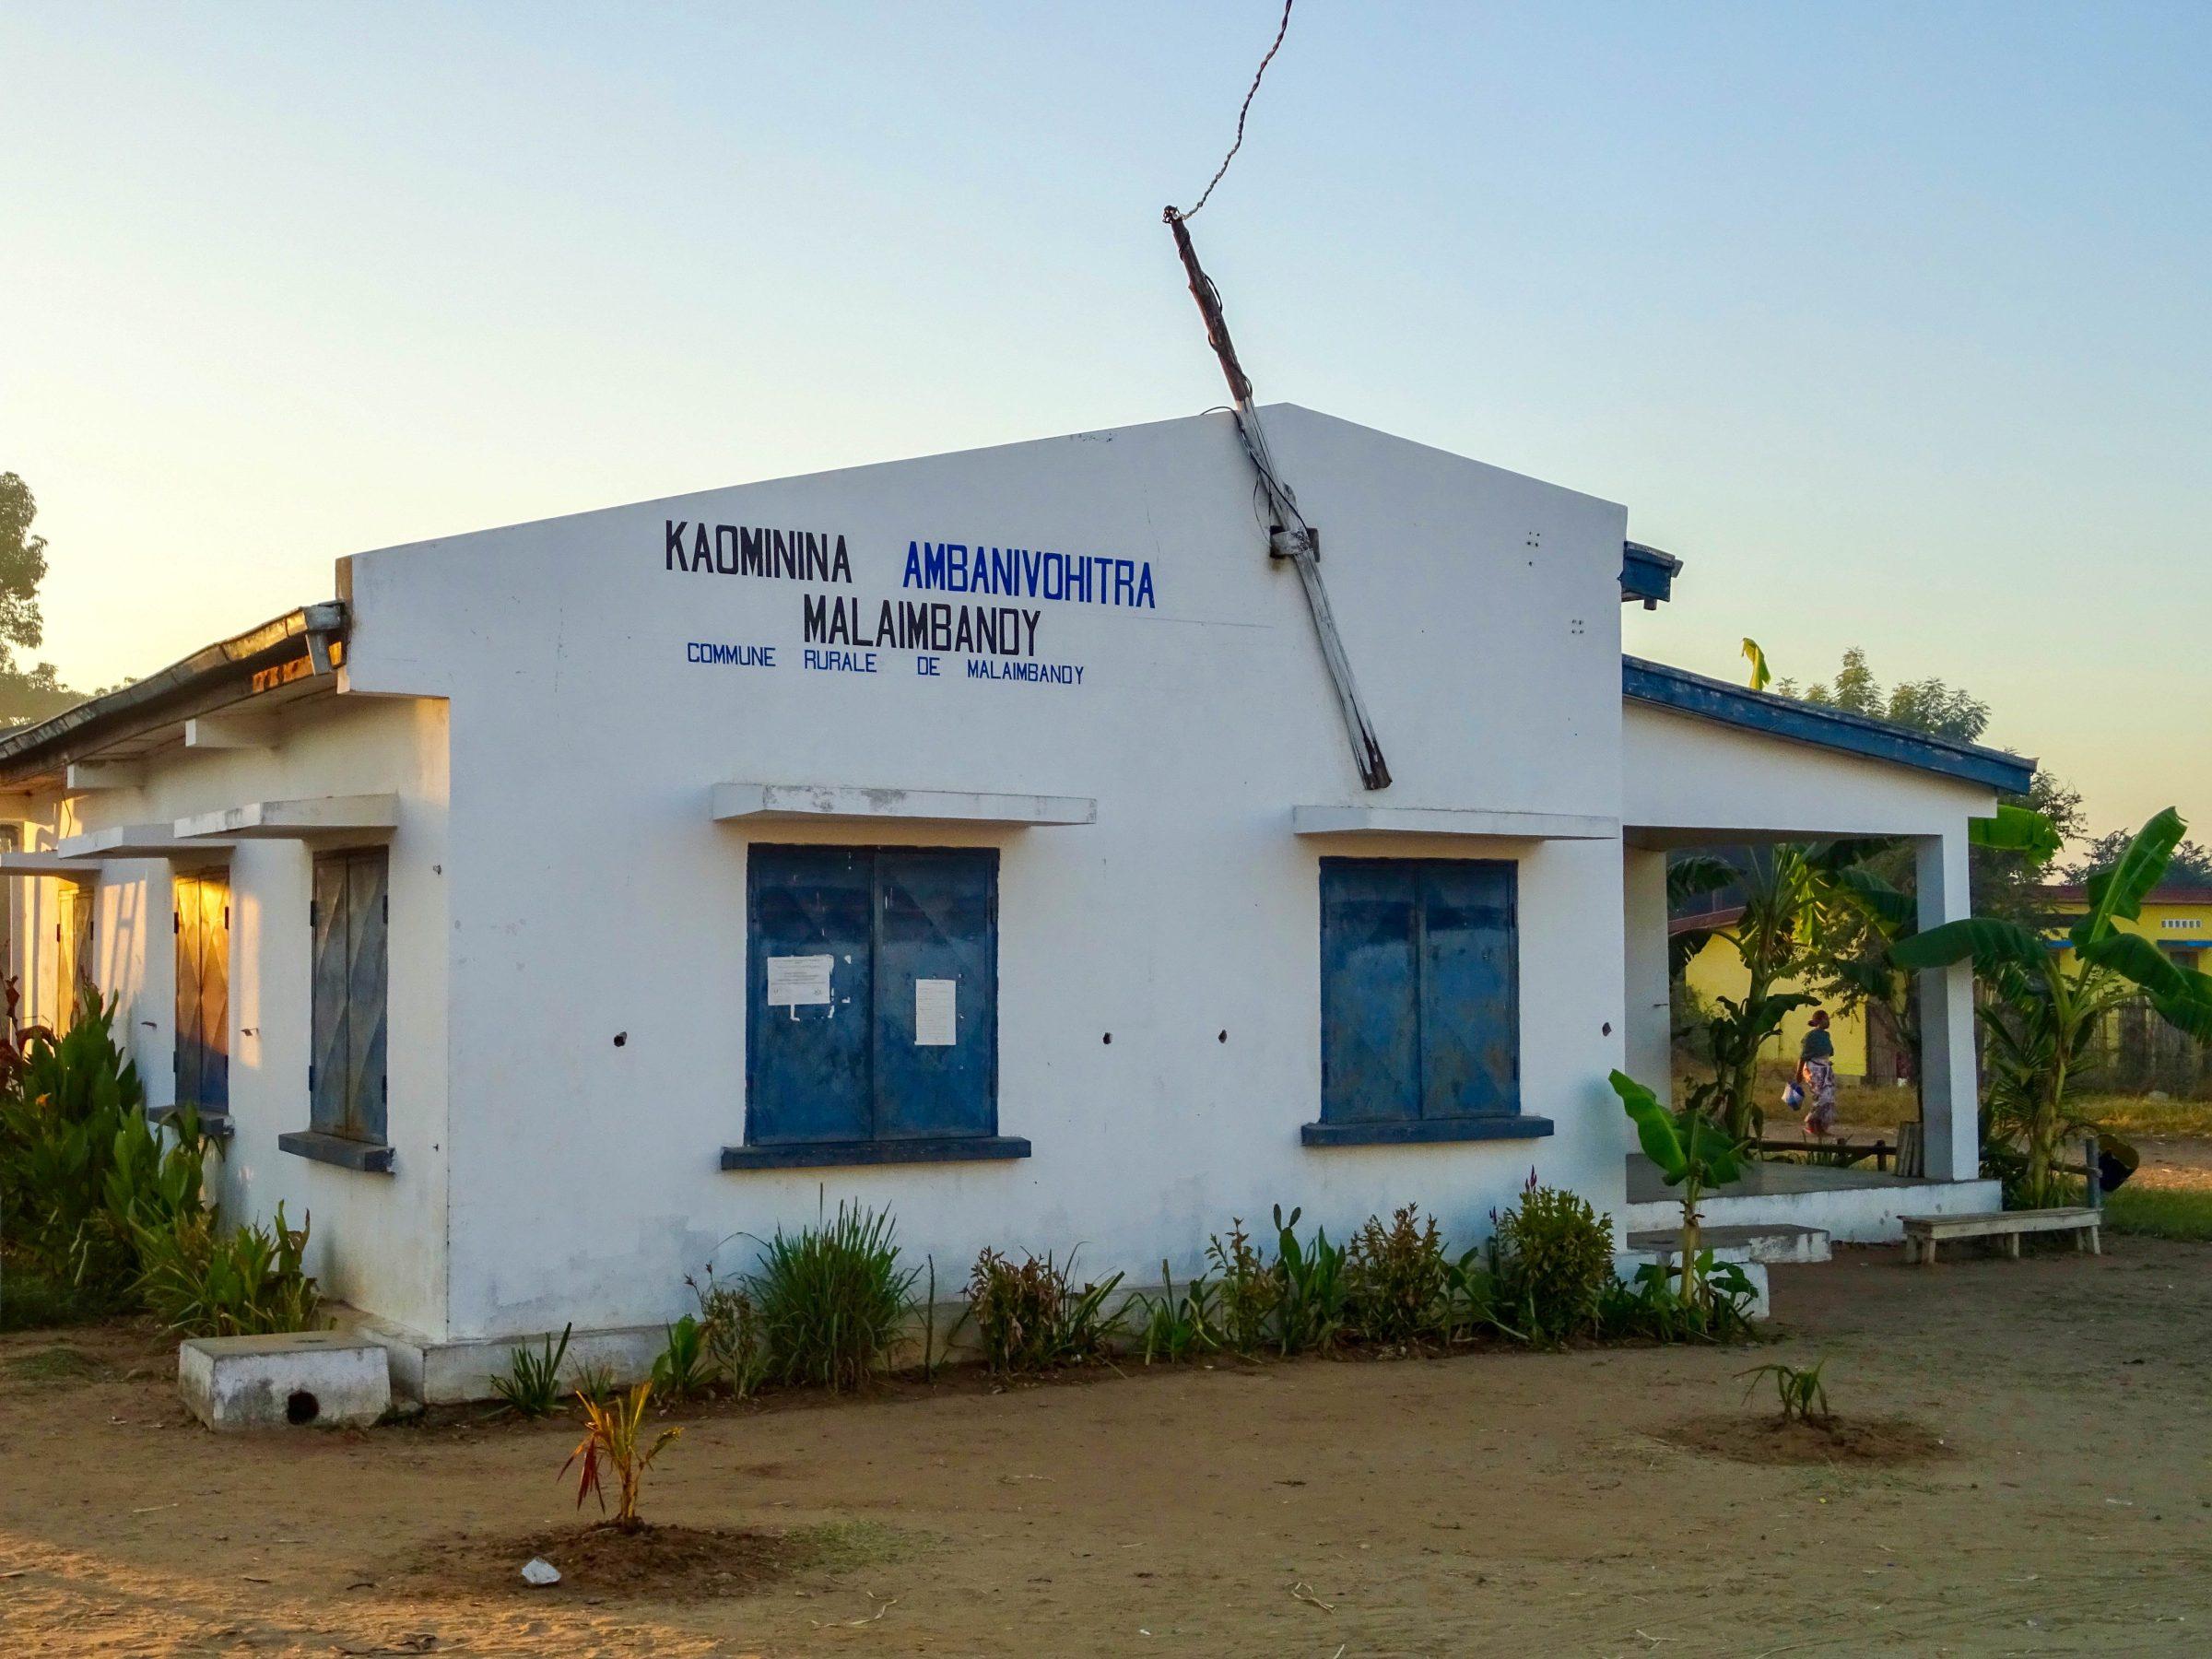 Dorpshuis van Malaimbandy